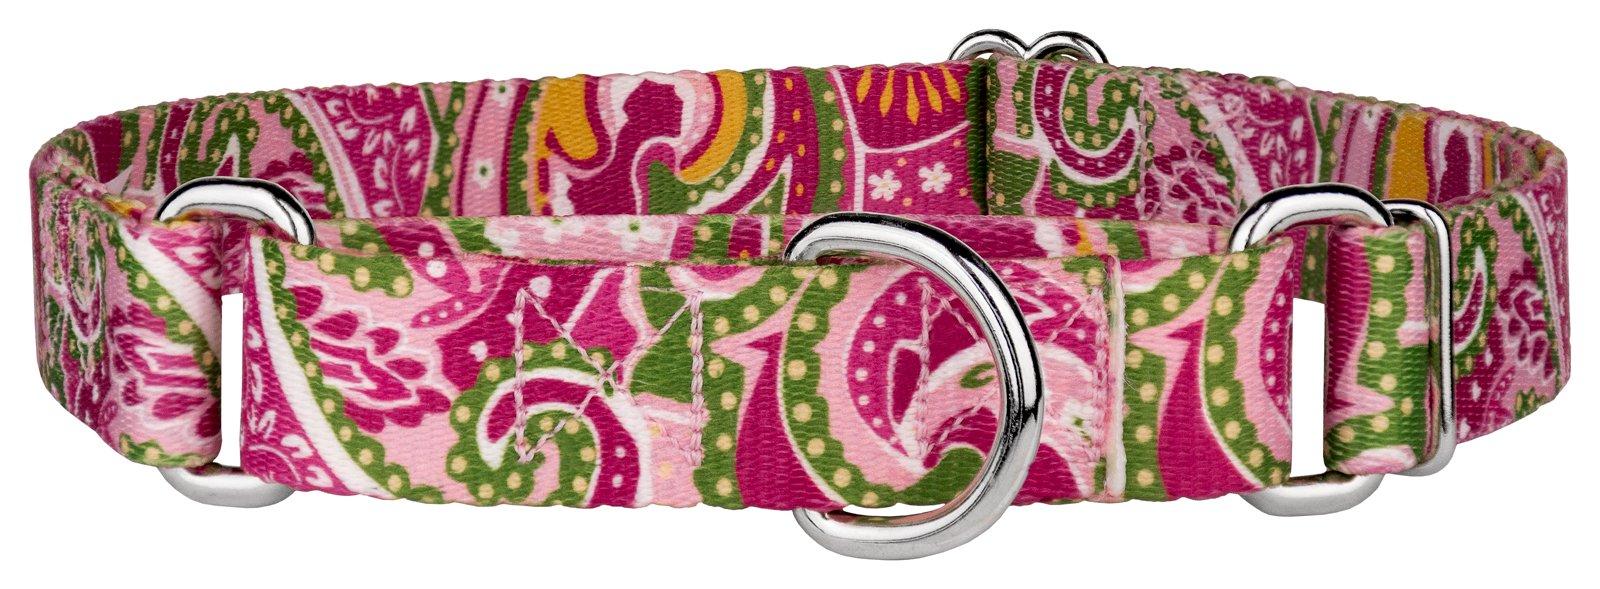 Country Brook Petz | Pink Paisley Featherweight Martingale Dog Collar - Mini